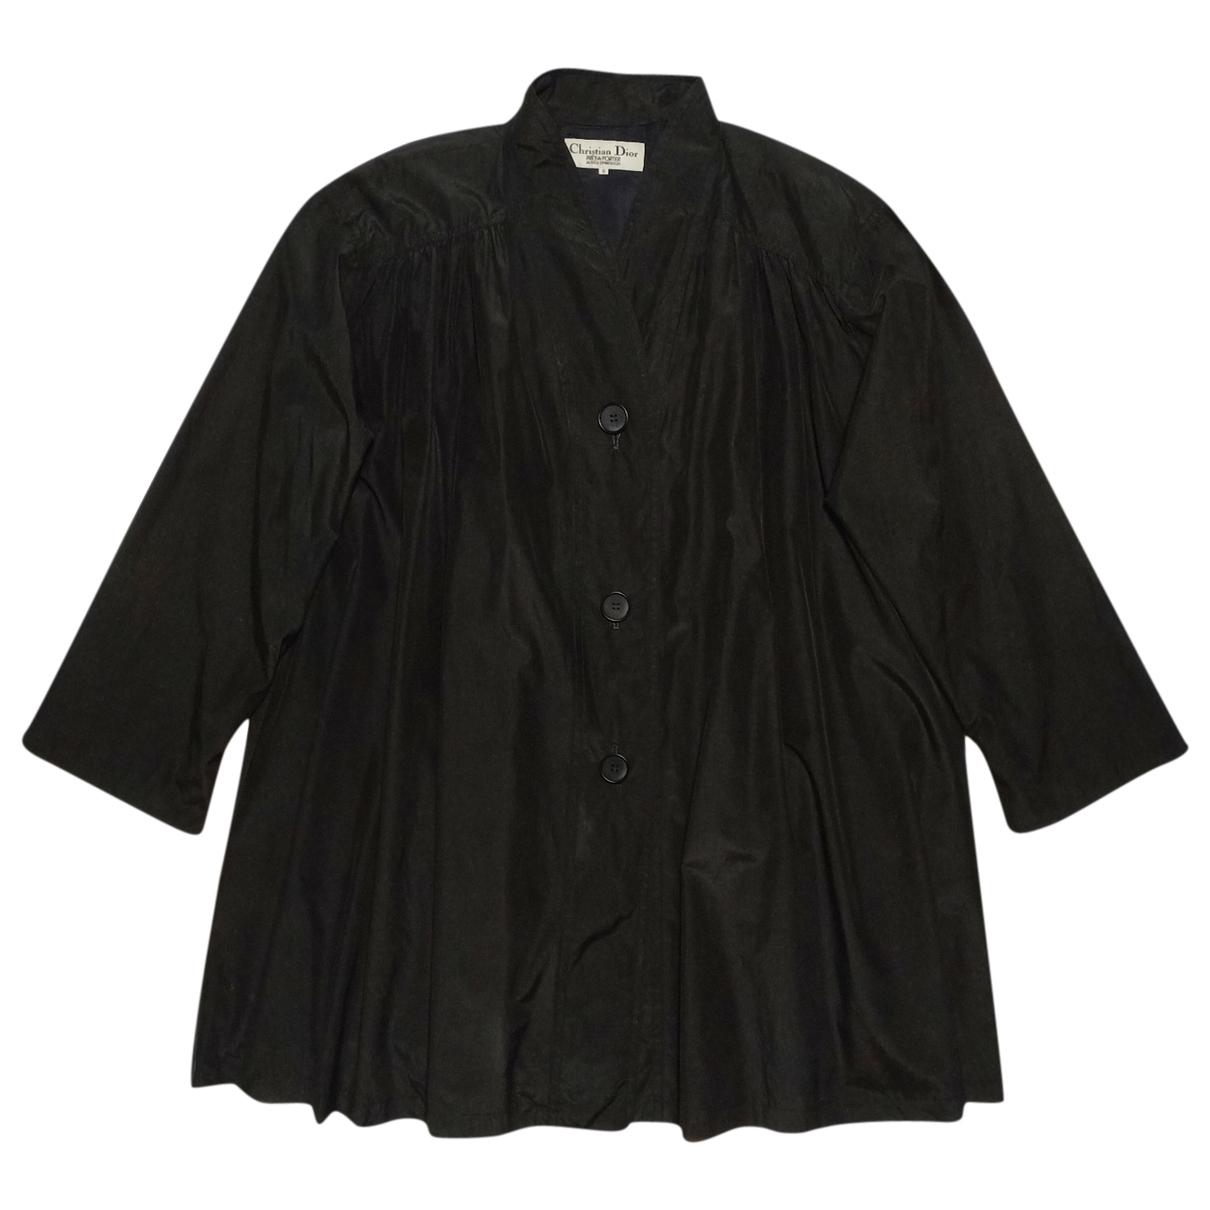 Dior \N Black Cotton jacket for Women L International